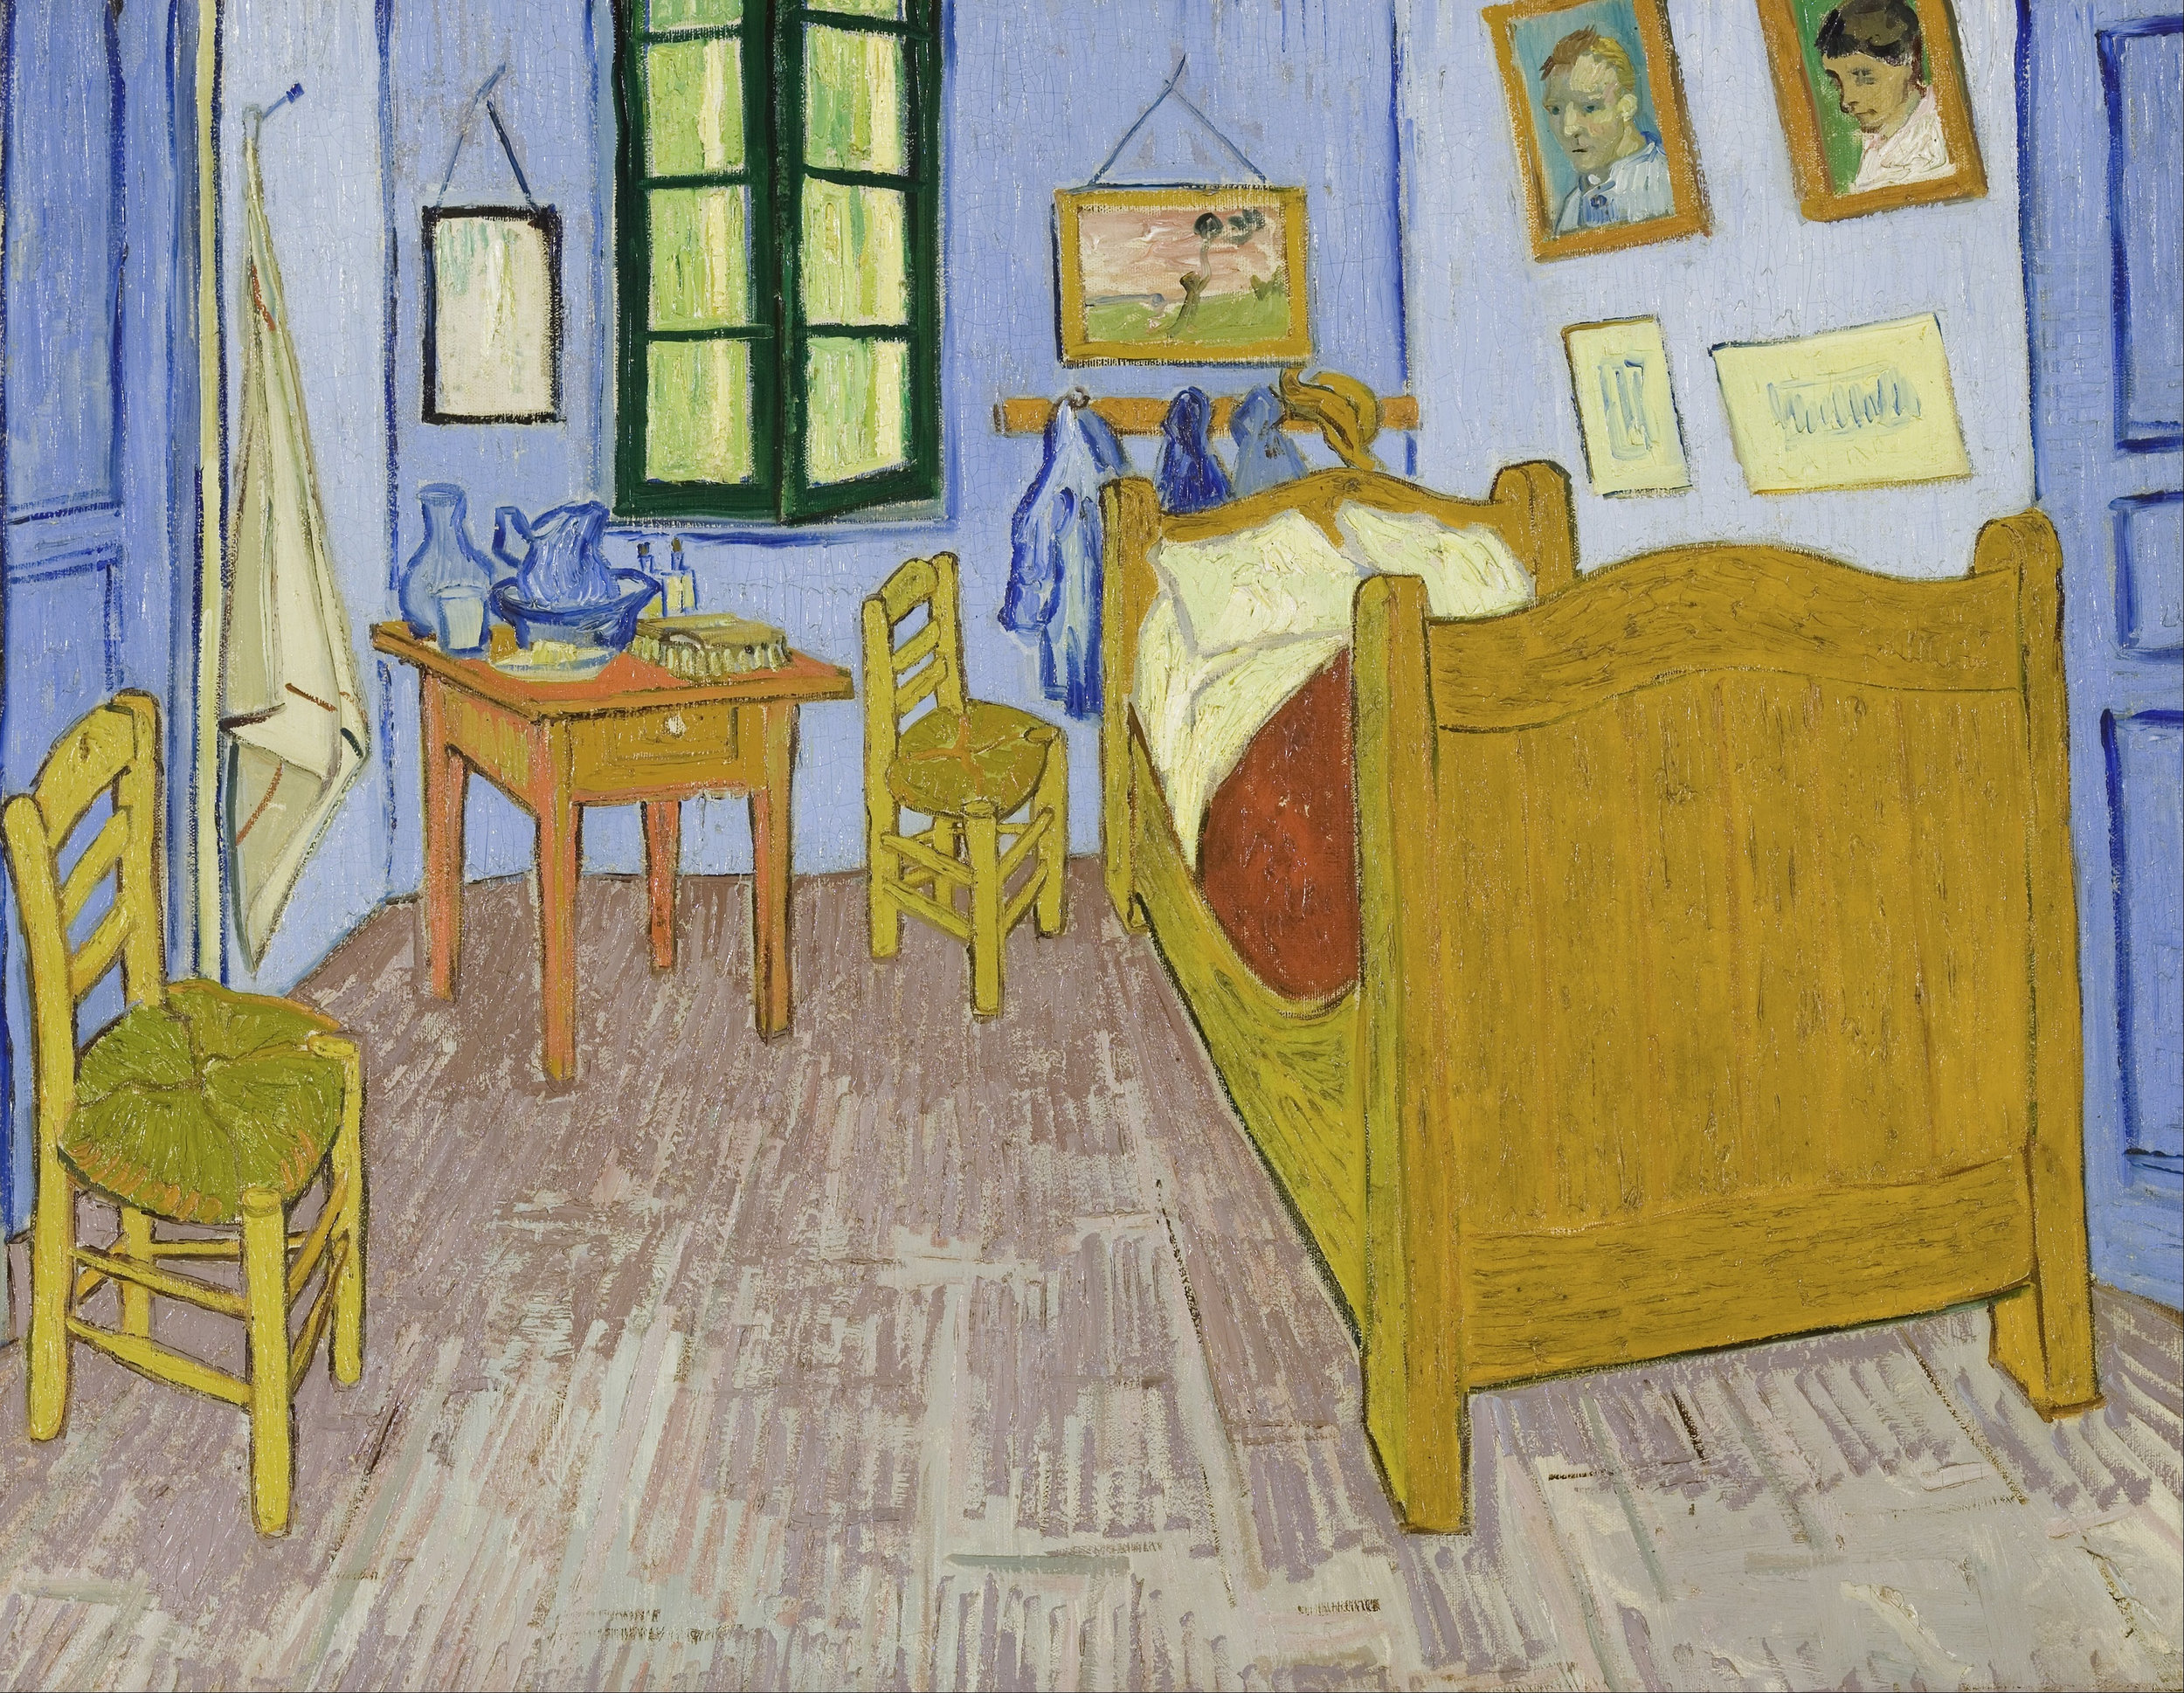 Vincent_van_Gogh_-_Van_Gogh's_Bedroom_in_Arles_-_Google_Art_Project.jpg